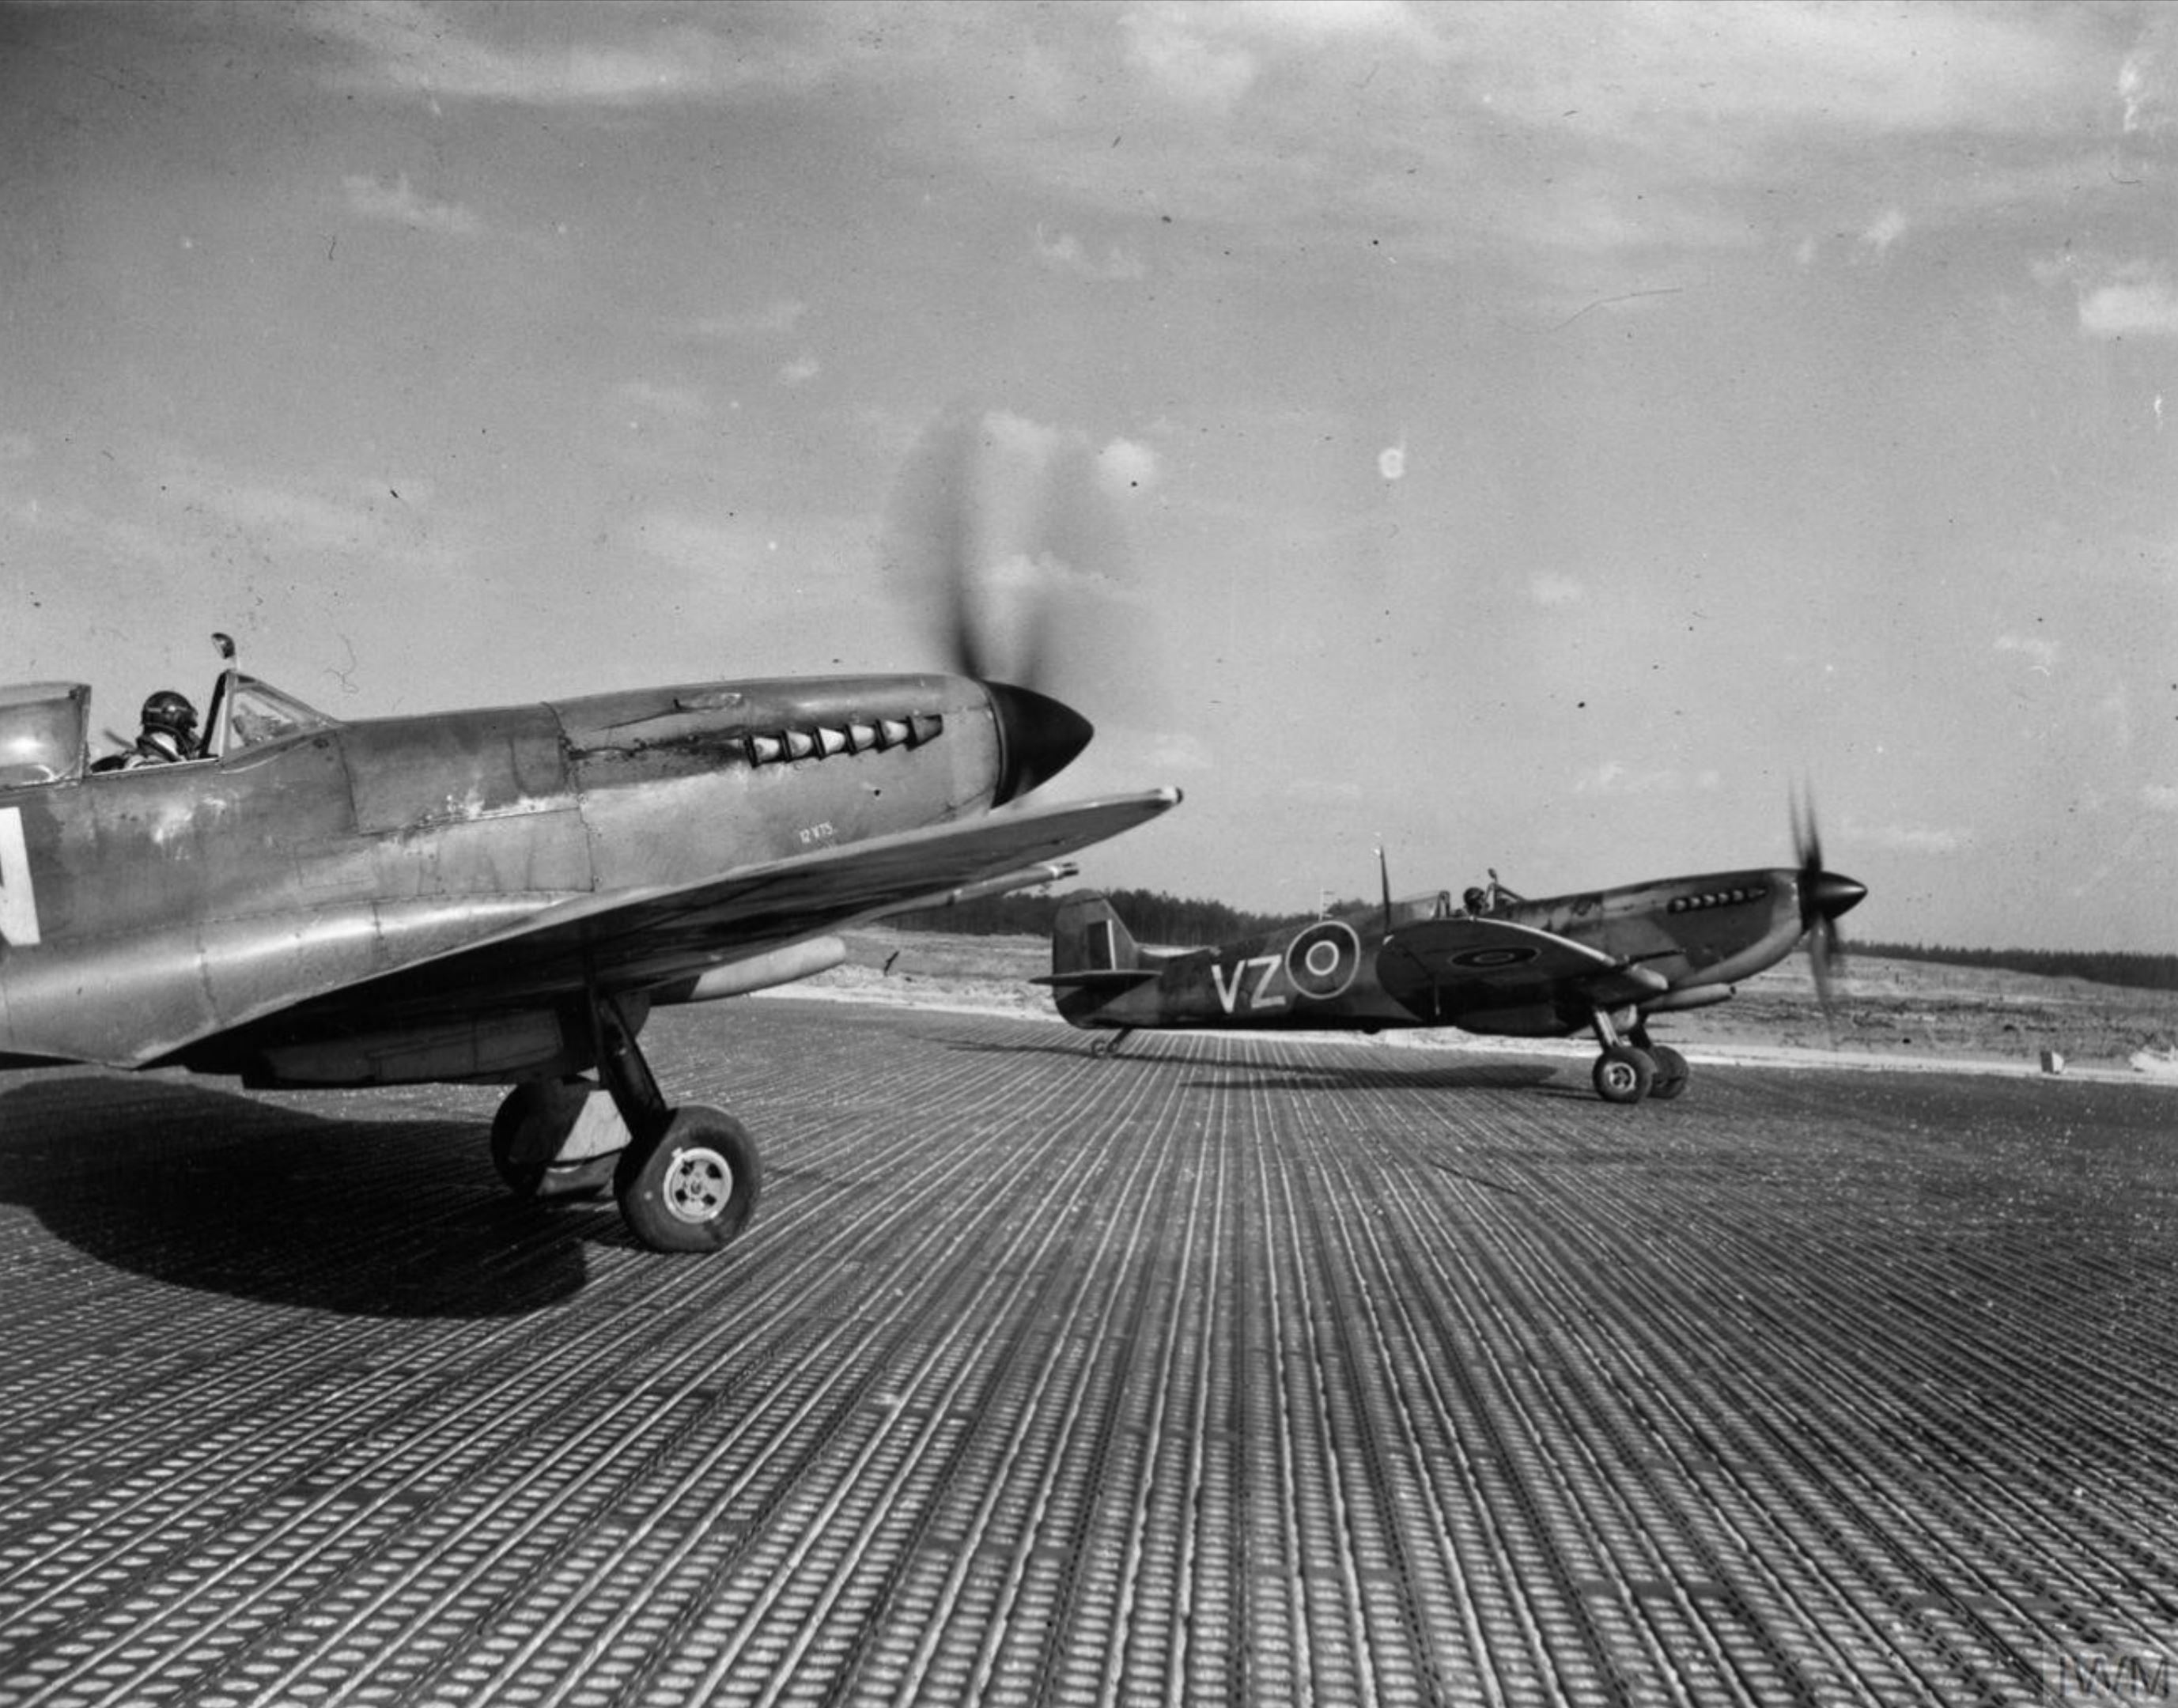 Spitfire MkIXe RCAF 412Sqn VZW taxing at B108 Rheine Germany 1945 IWM MH6850